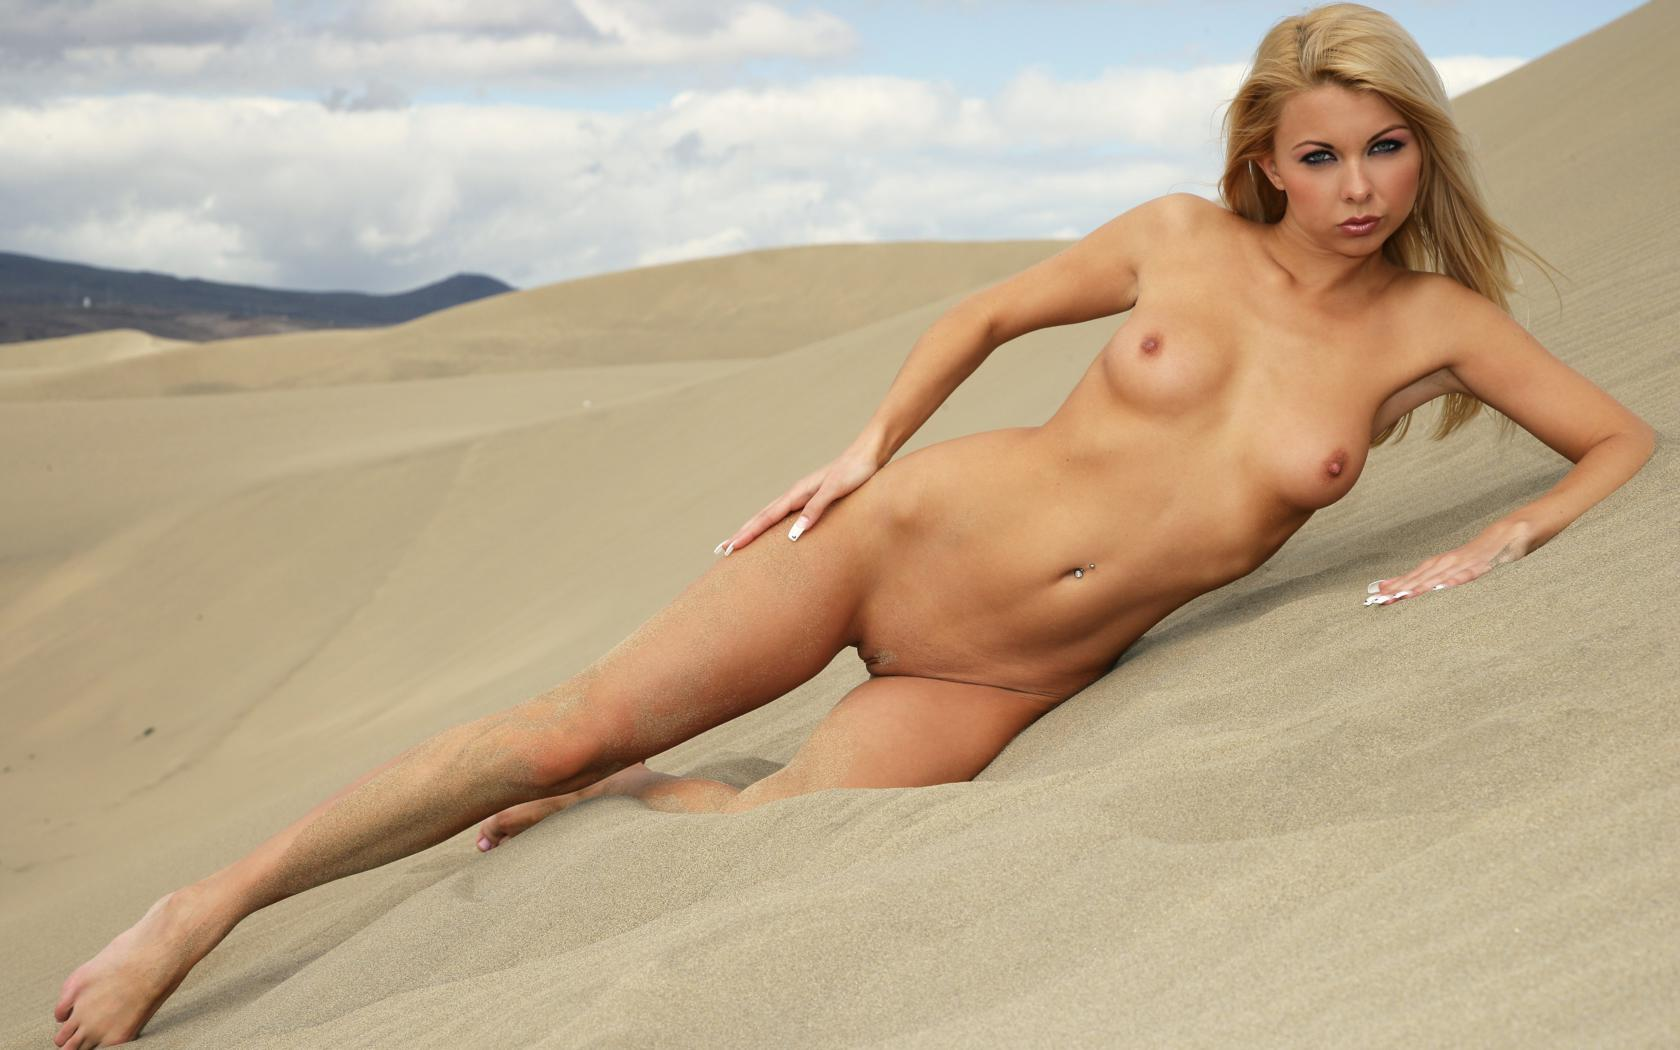 Sexy Girl Nude On Beach